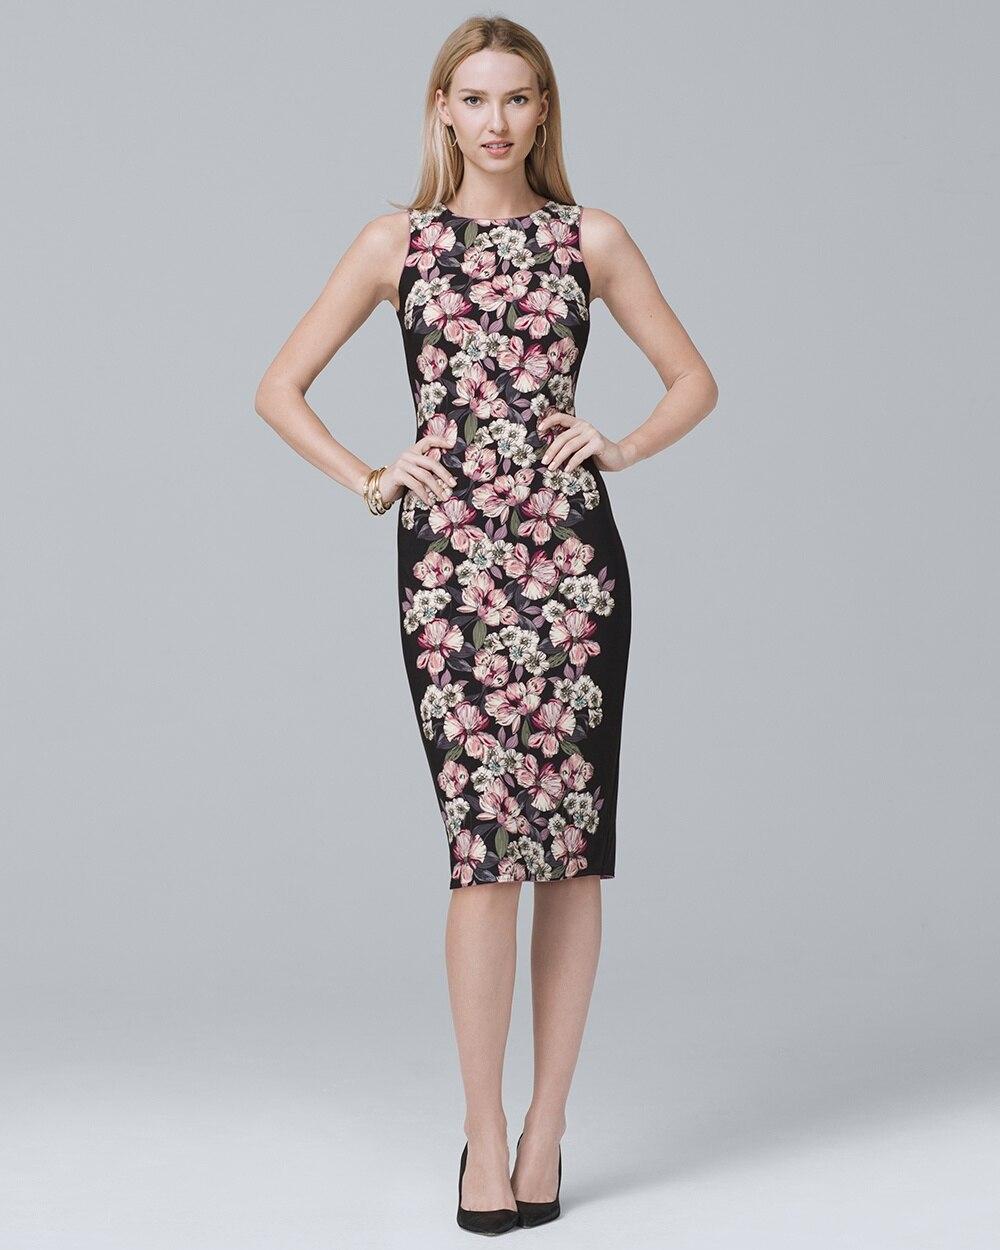 c6f3f8b658 Reversible Floral-Print Sheath Dress - White House Black Market